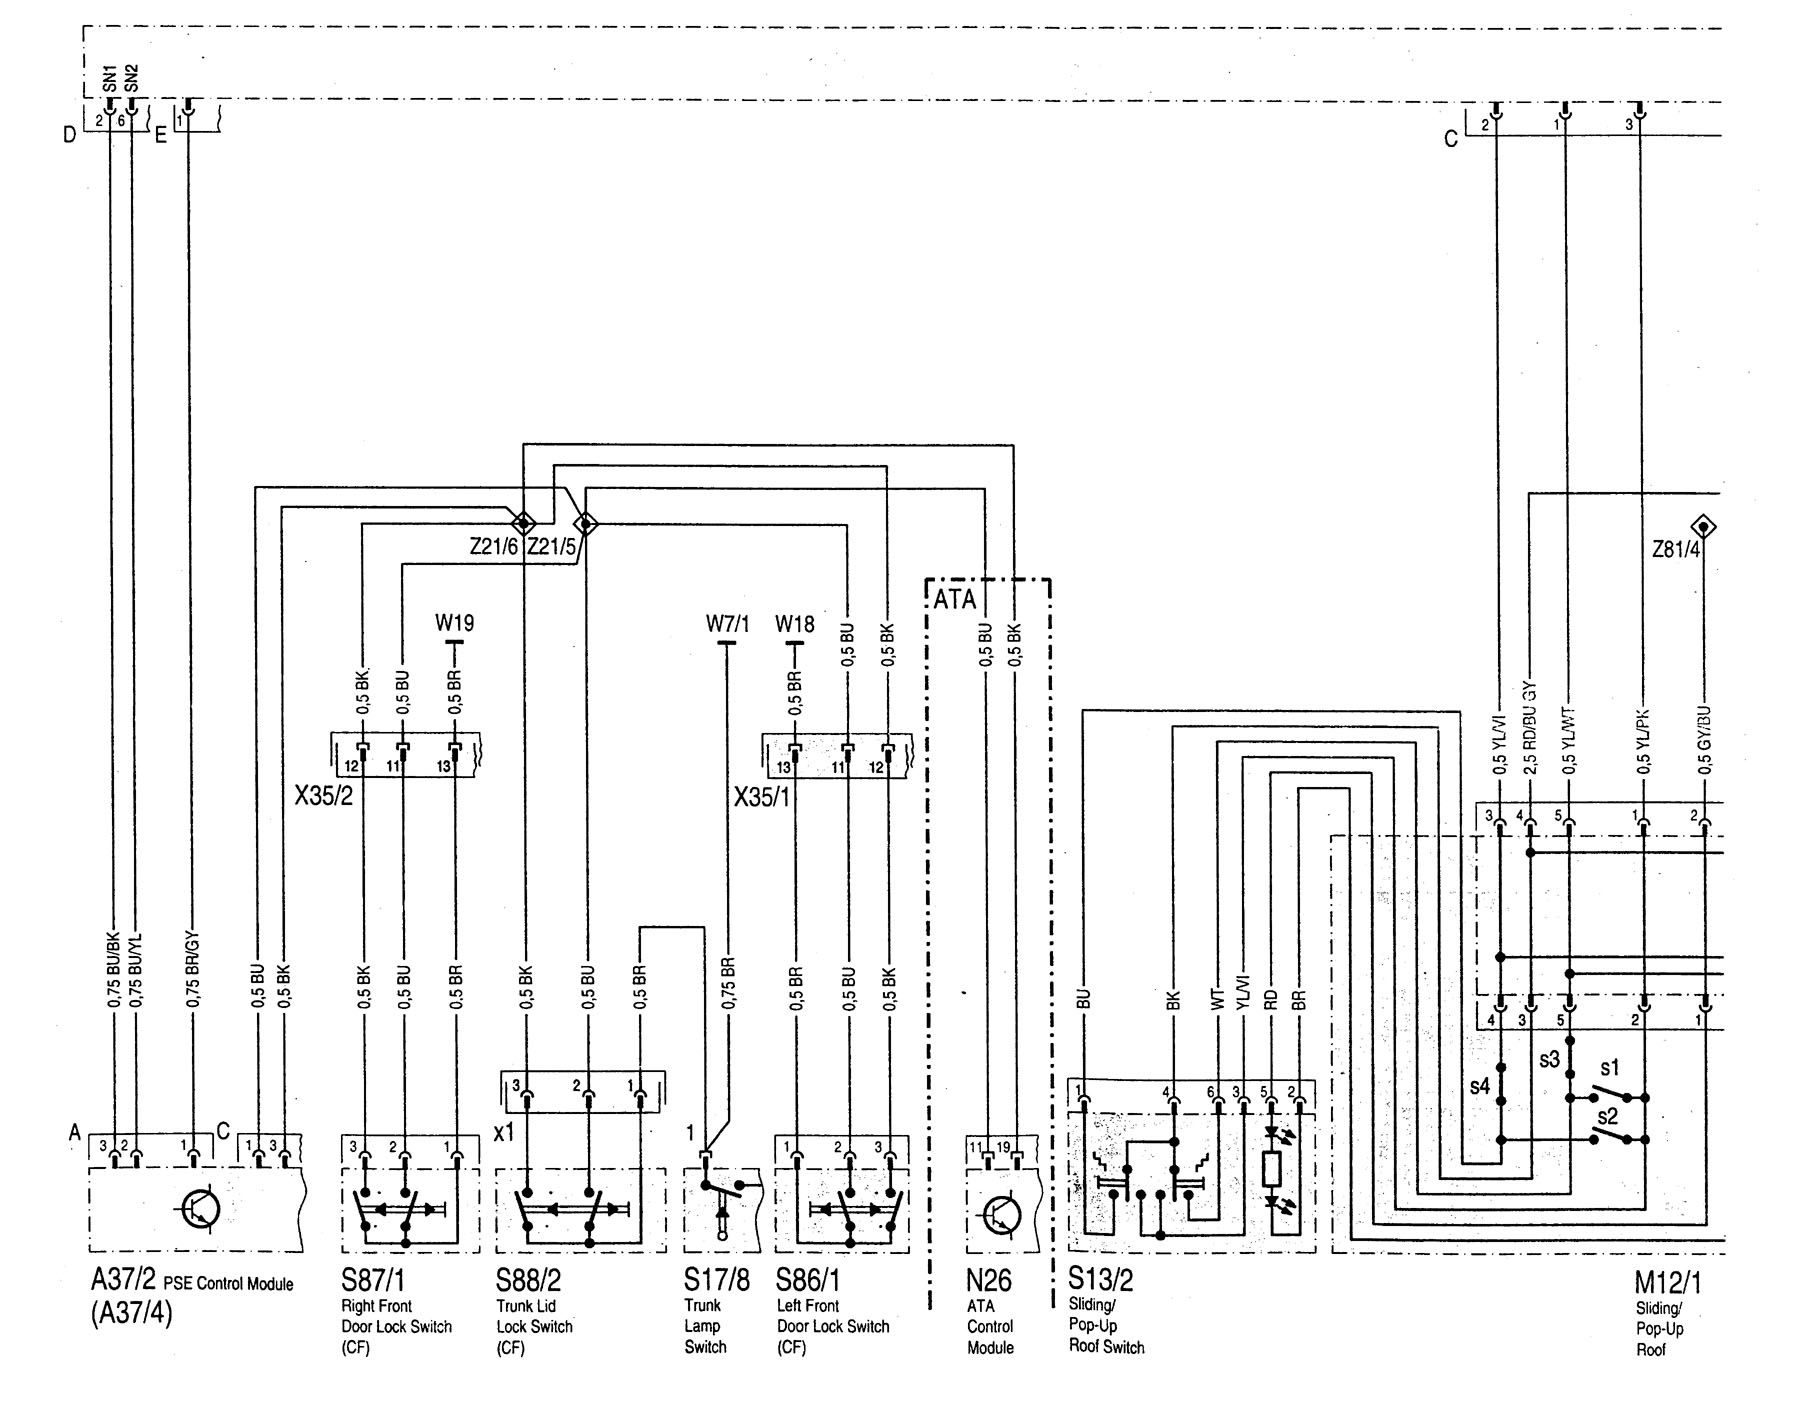 [SCHEMATICS_48IU]  Mercedes-Benz C220 (1994 - 1996) - wiring diagrams - driver infromation  center/message center - Carknowledge.info | Mercedes Benz C220 Wiring |  | Carknowledge.info